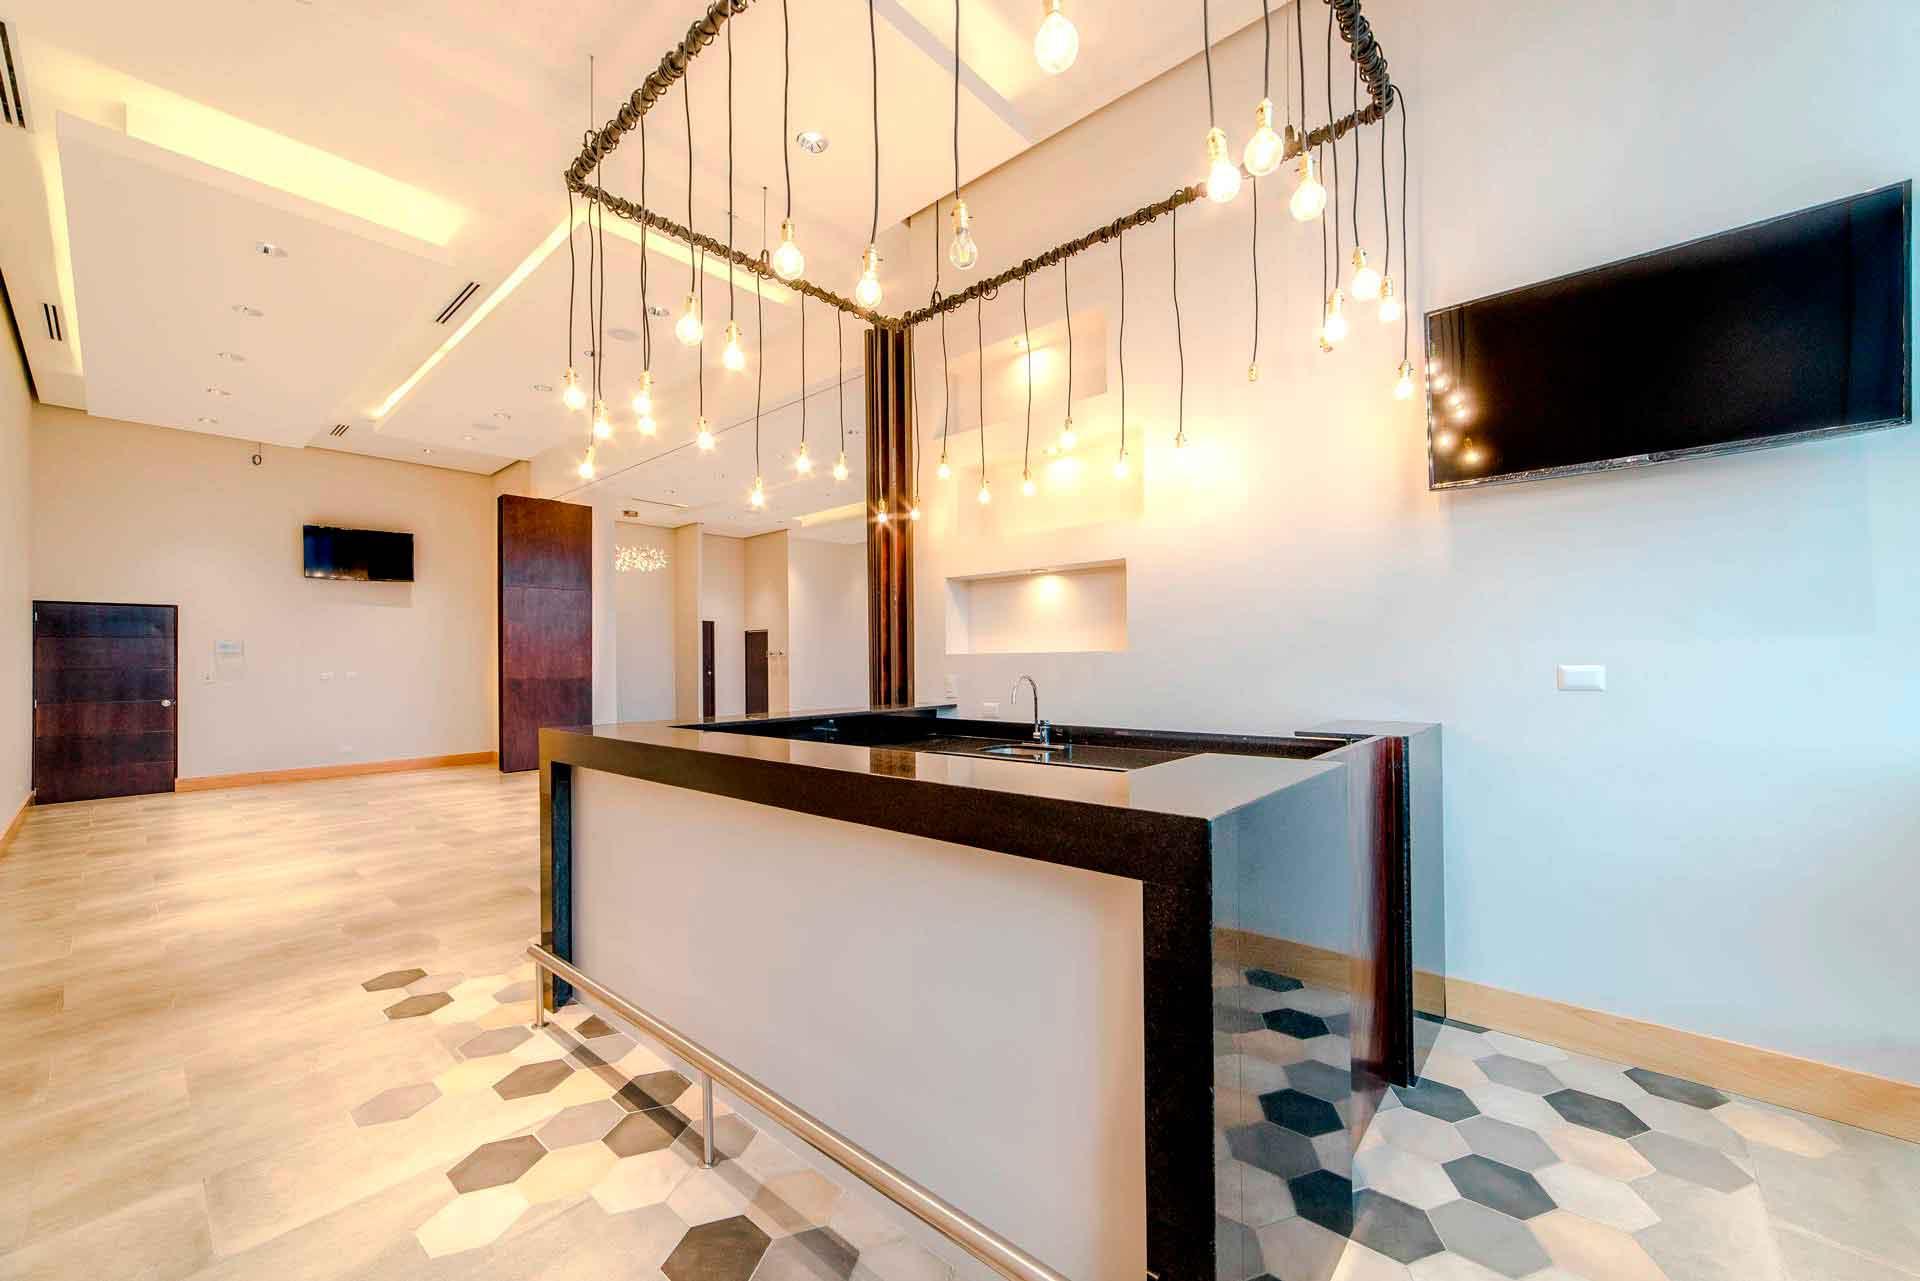 Parque las Americas Salon de Eventos Redes 9 - sky lounge